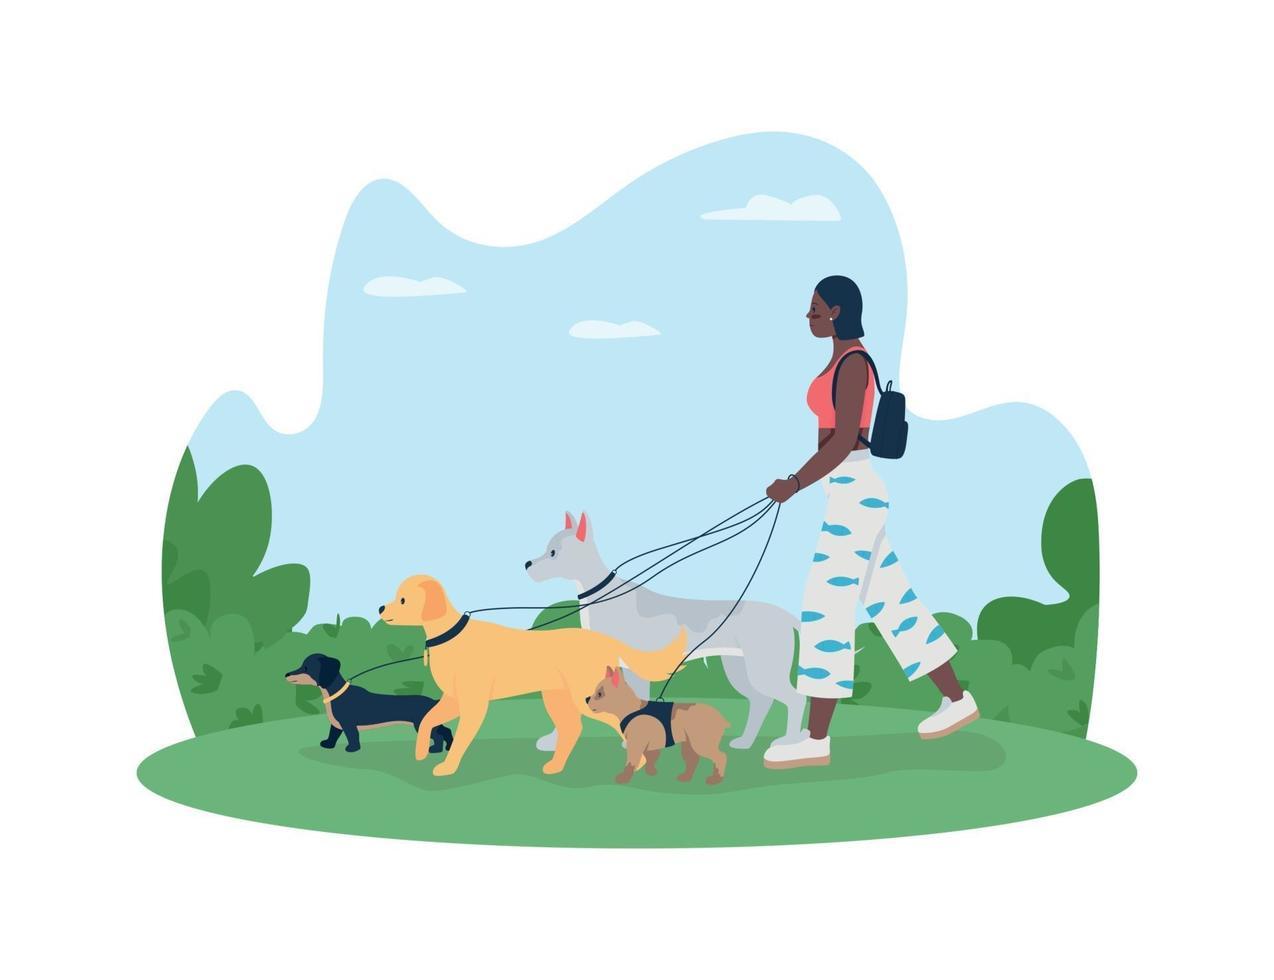 hund promenader 2d vektor webb banner, affisch